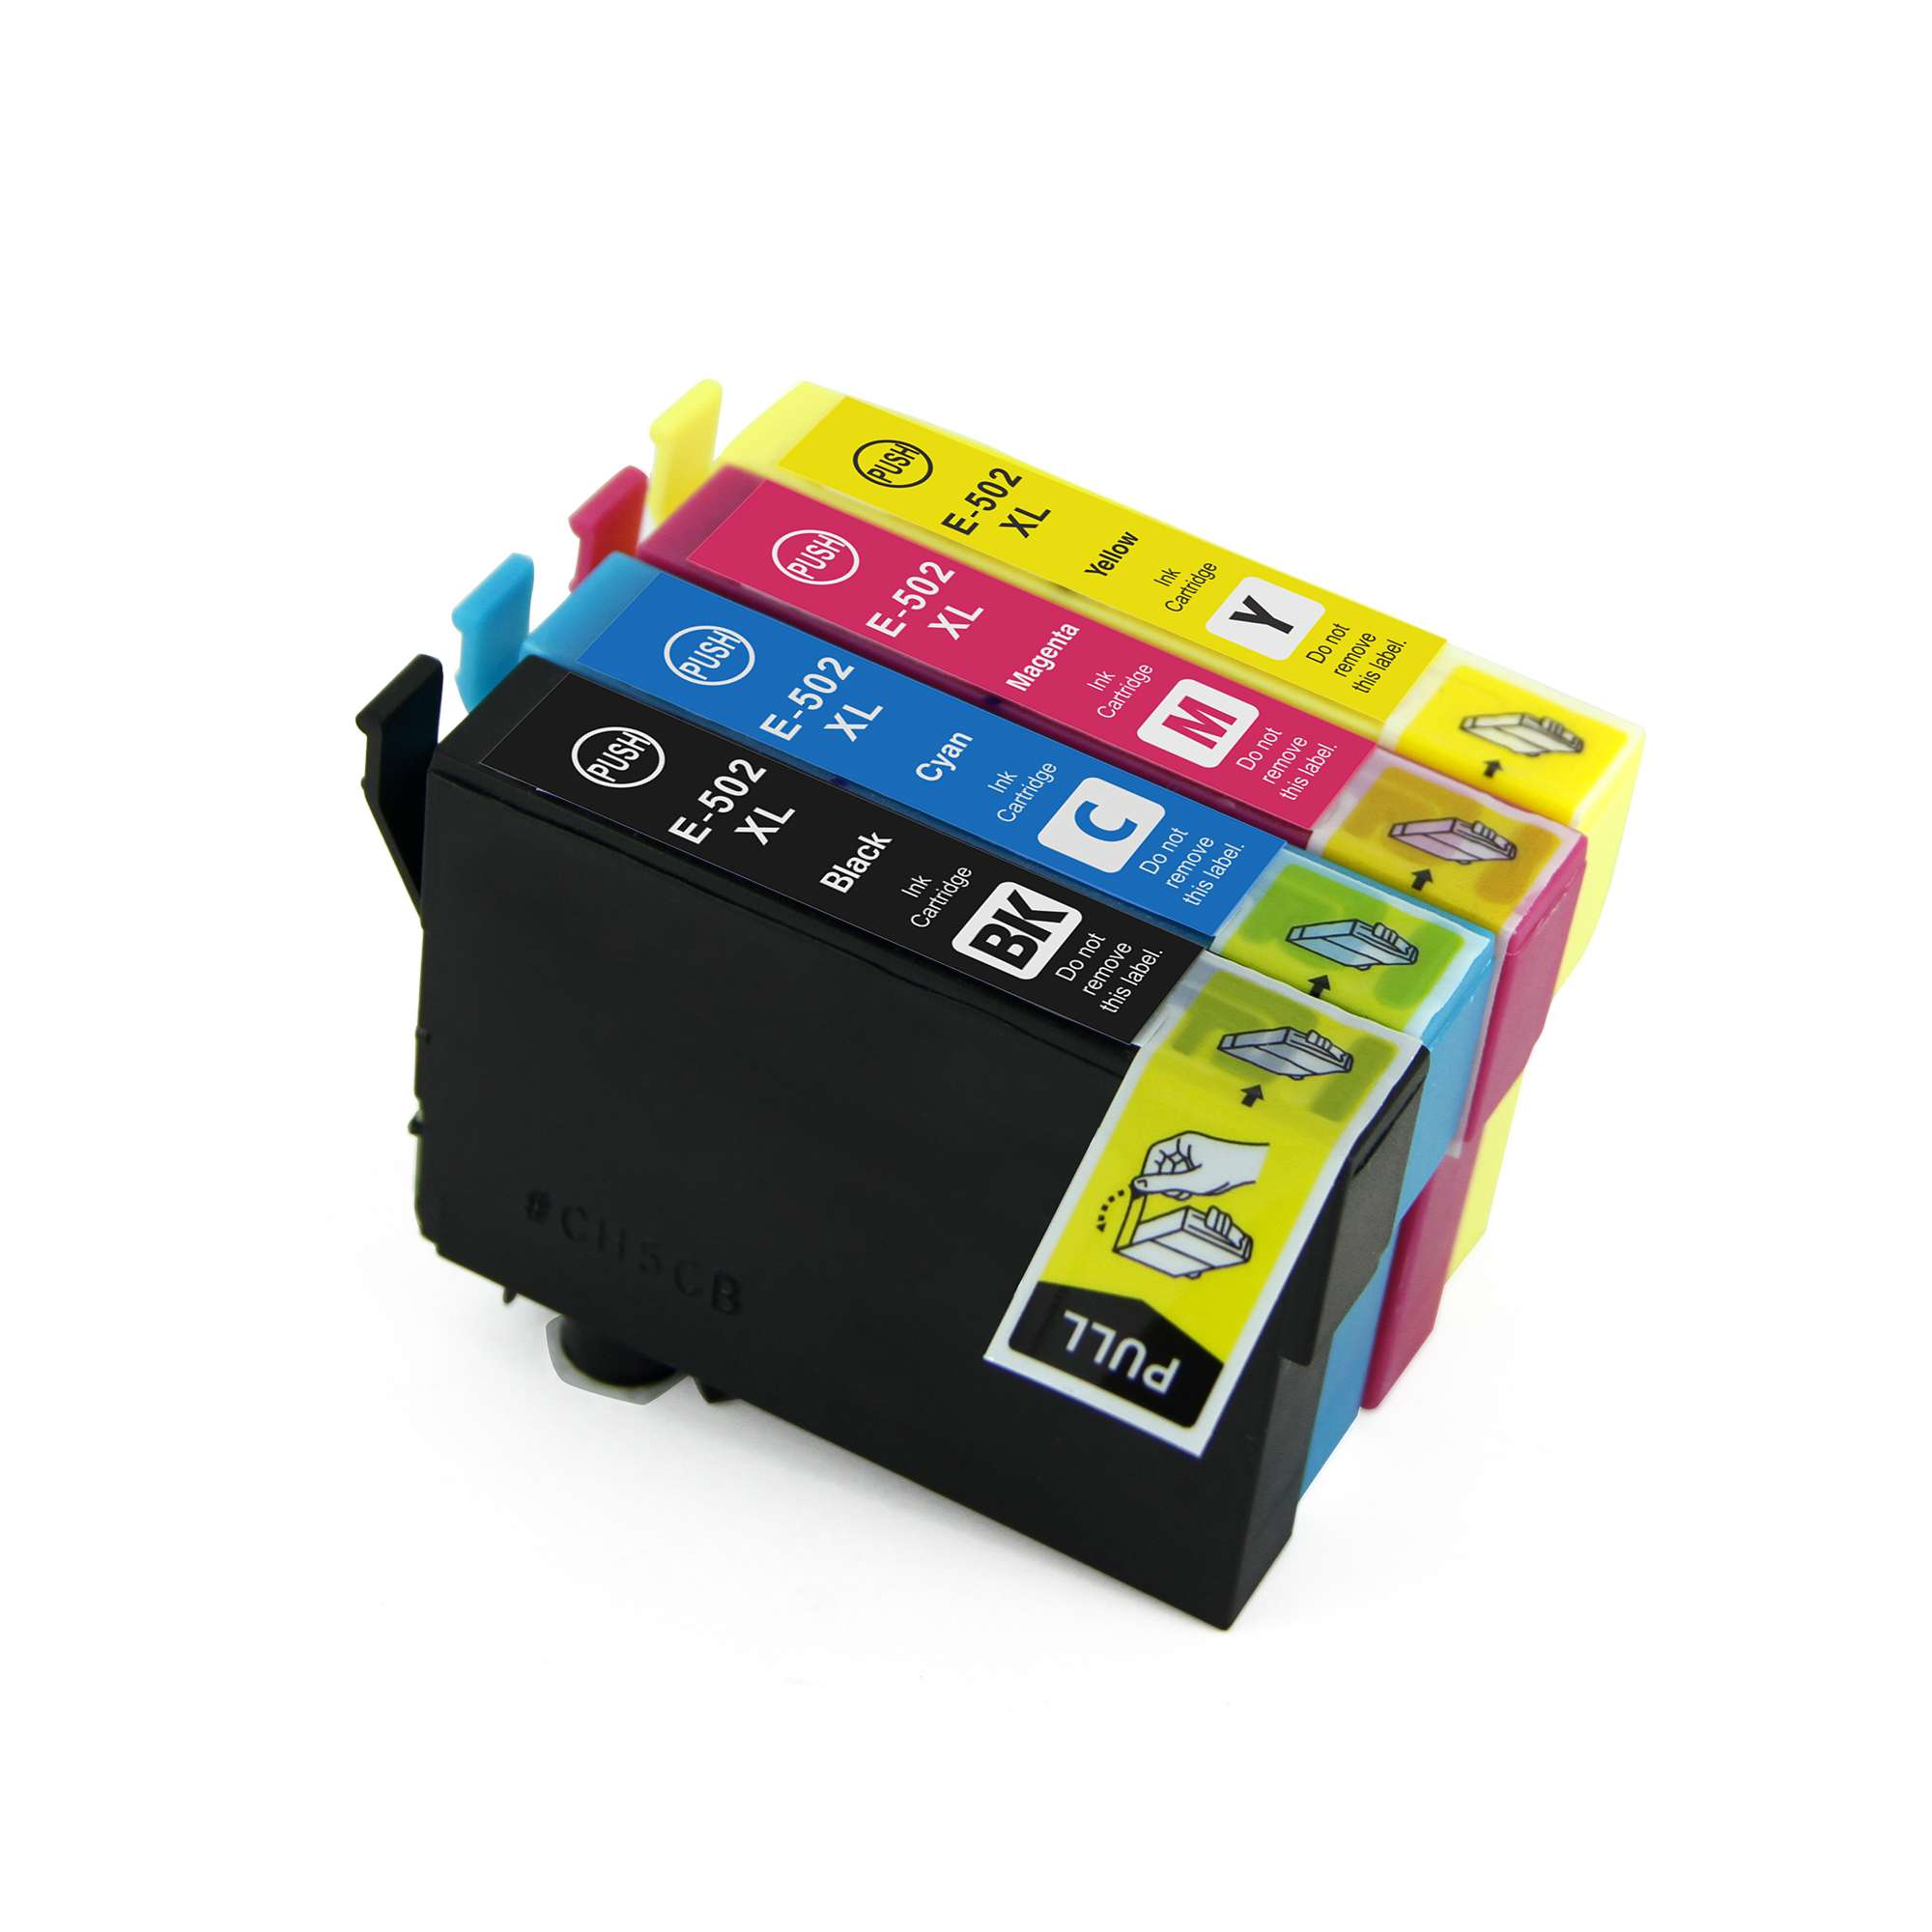 Epson Multipack Ink Cartridges (T502XLBK/T502XLC/T502XLM/T502XLY)